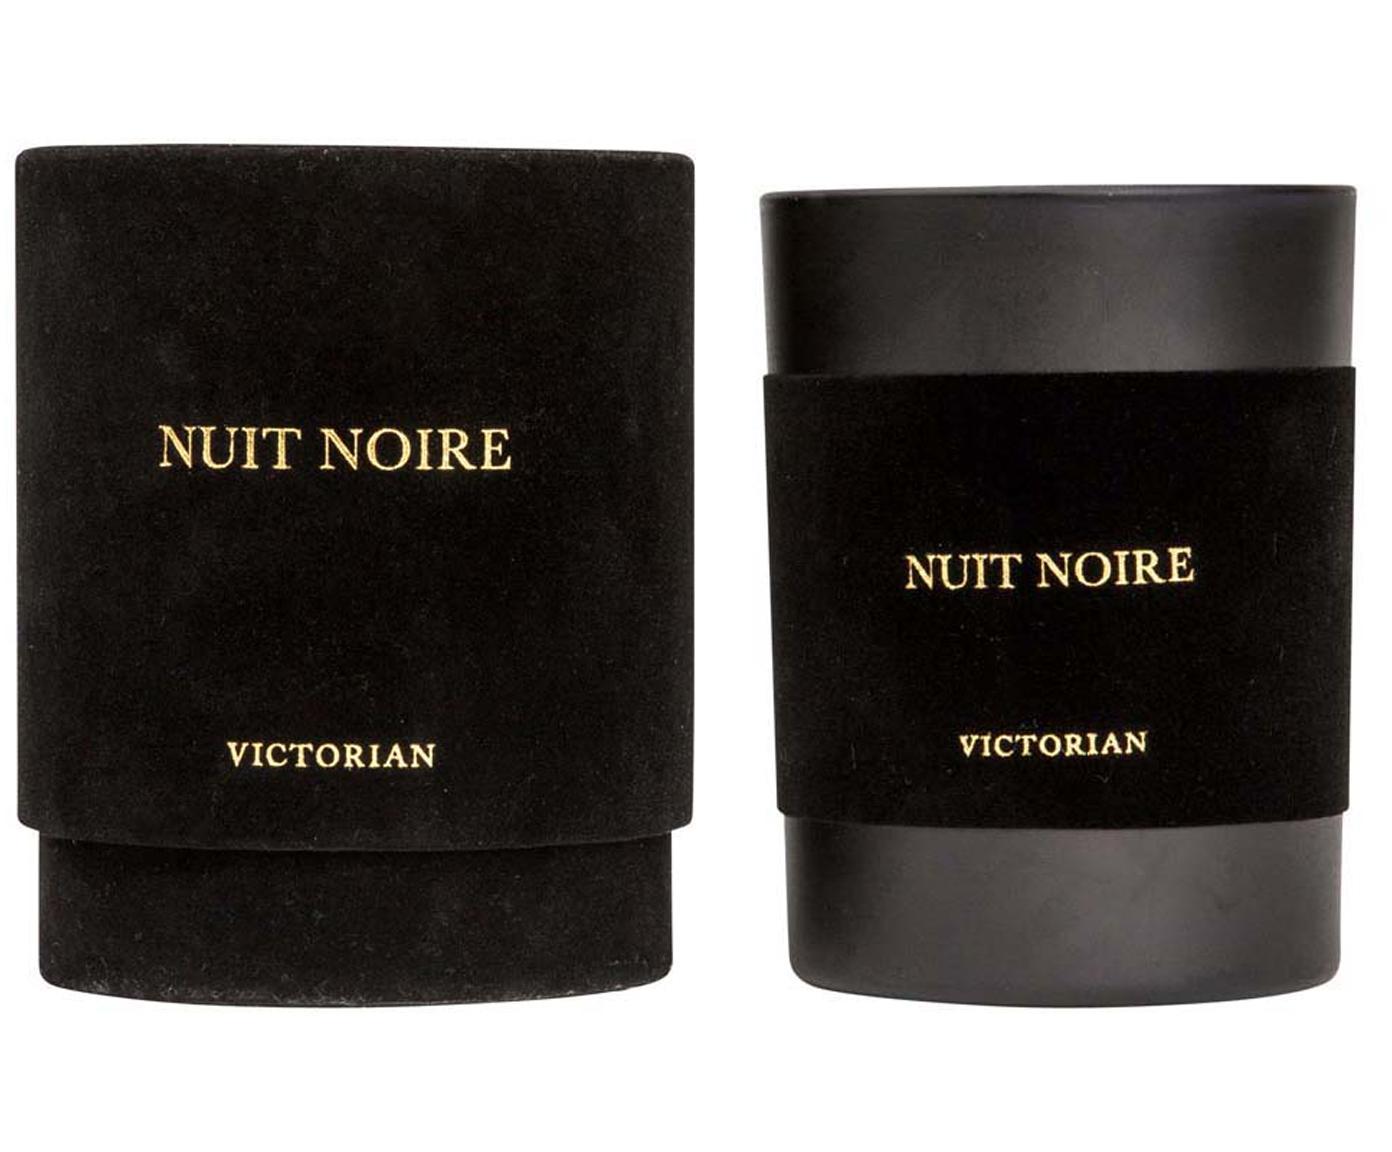 Geurkaars Nuit Noire (jasmijn & muskus), Houder: glas, Zwart, Ø 8 x H 10 cm